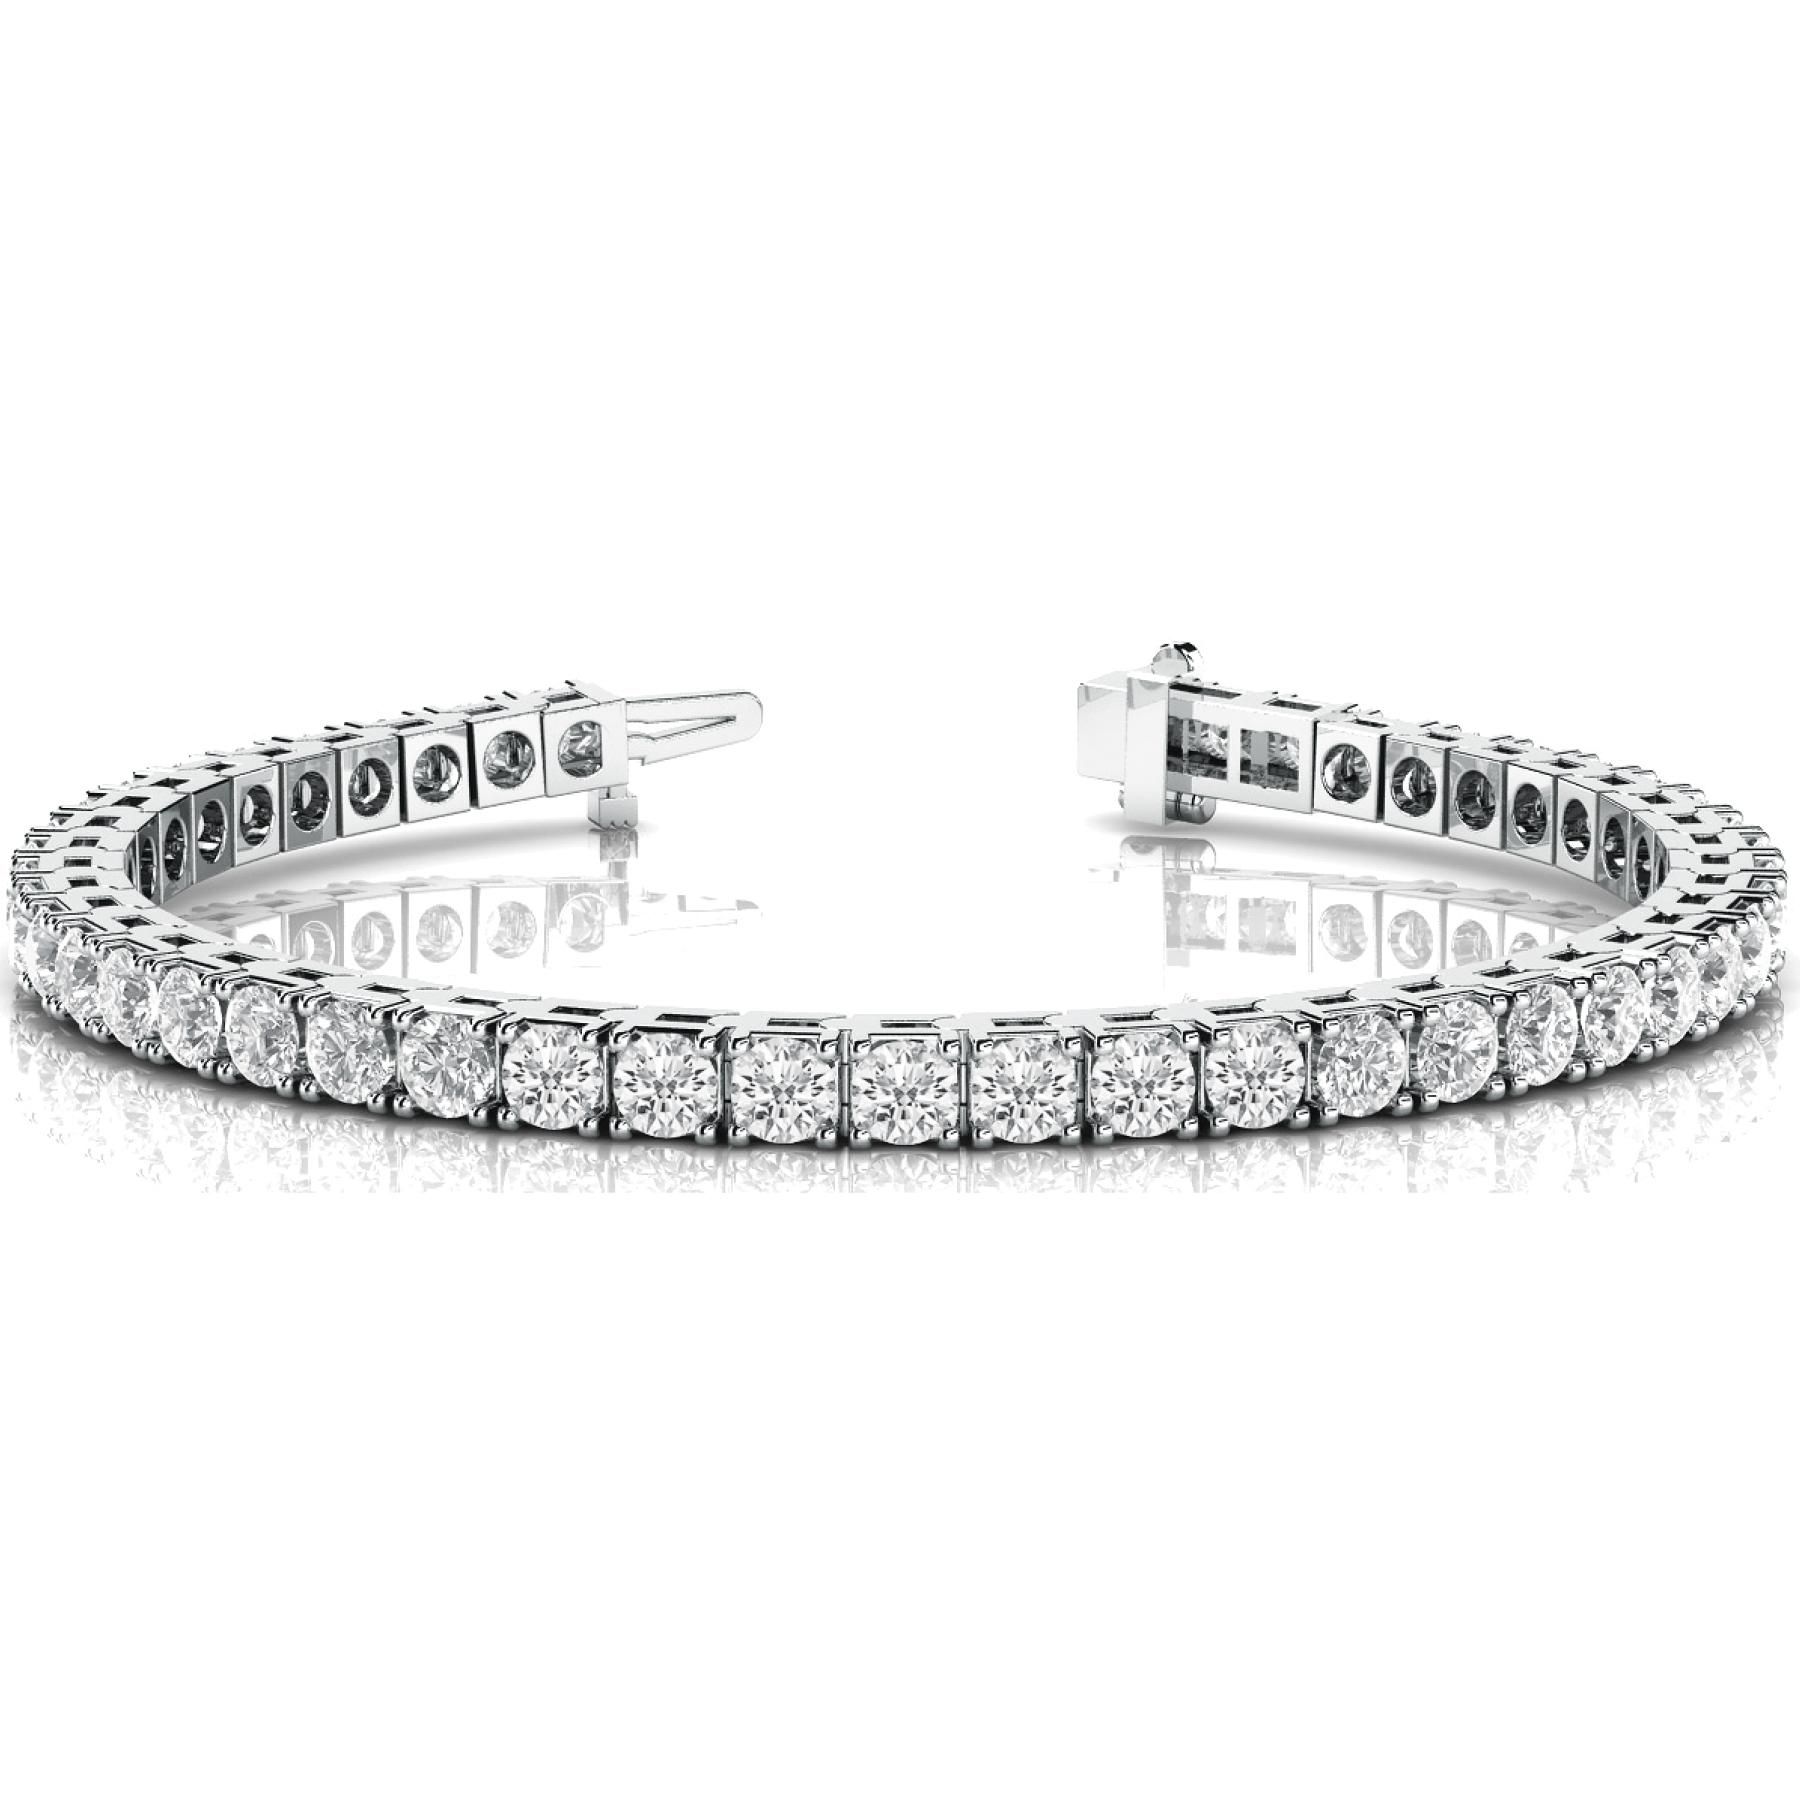 14k-white-gold-prong-set-tennis-diamond-bracelet-4490-01-05